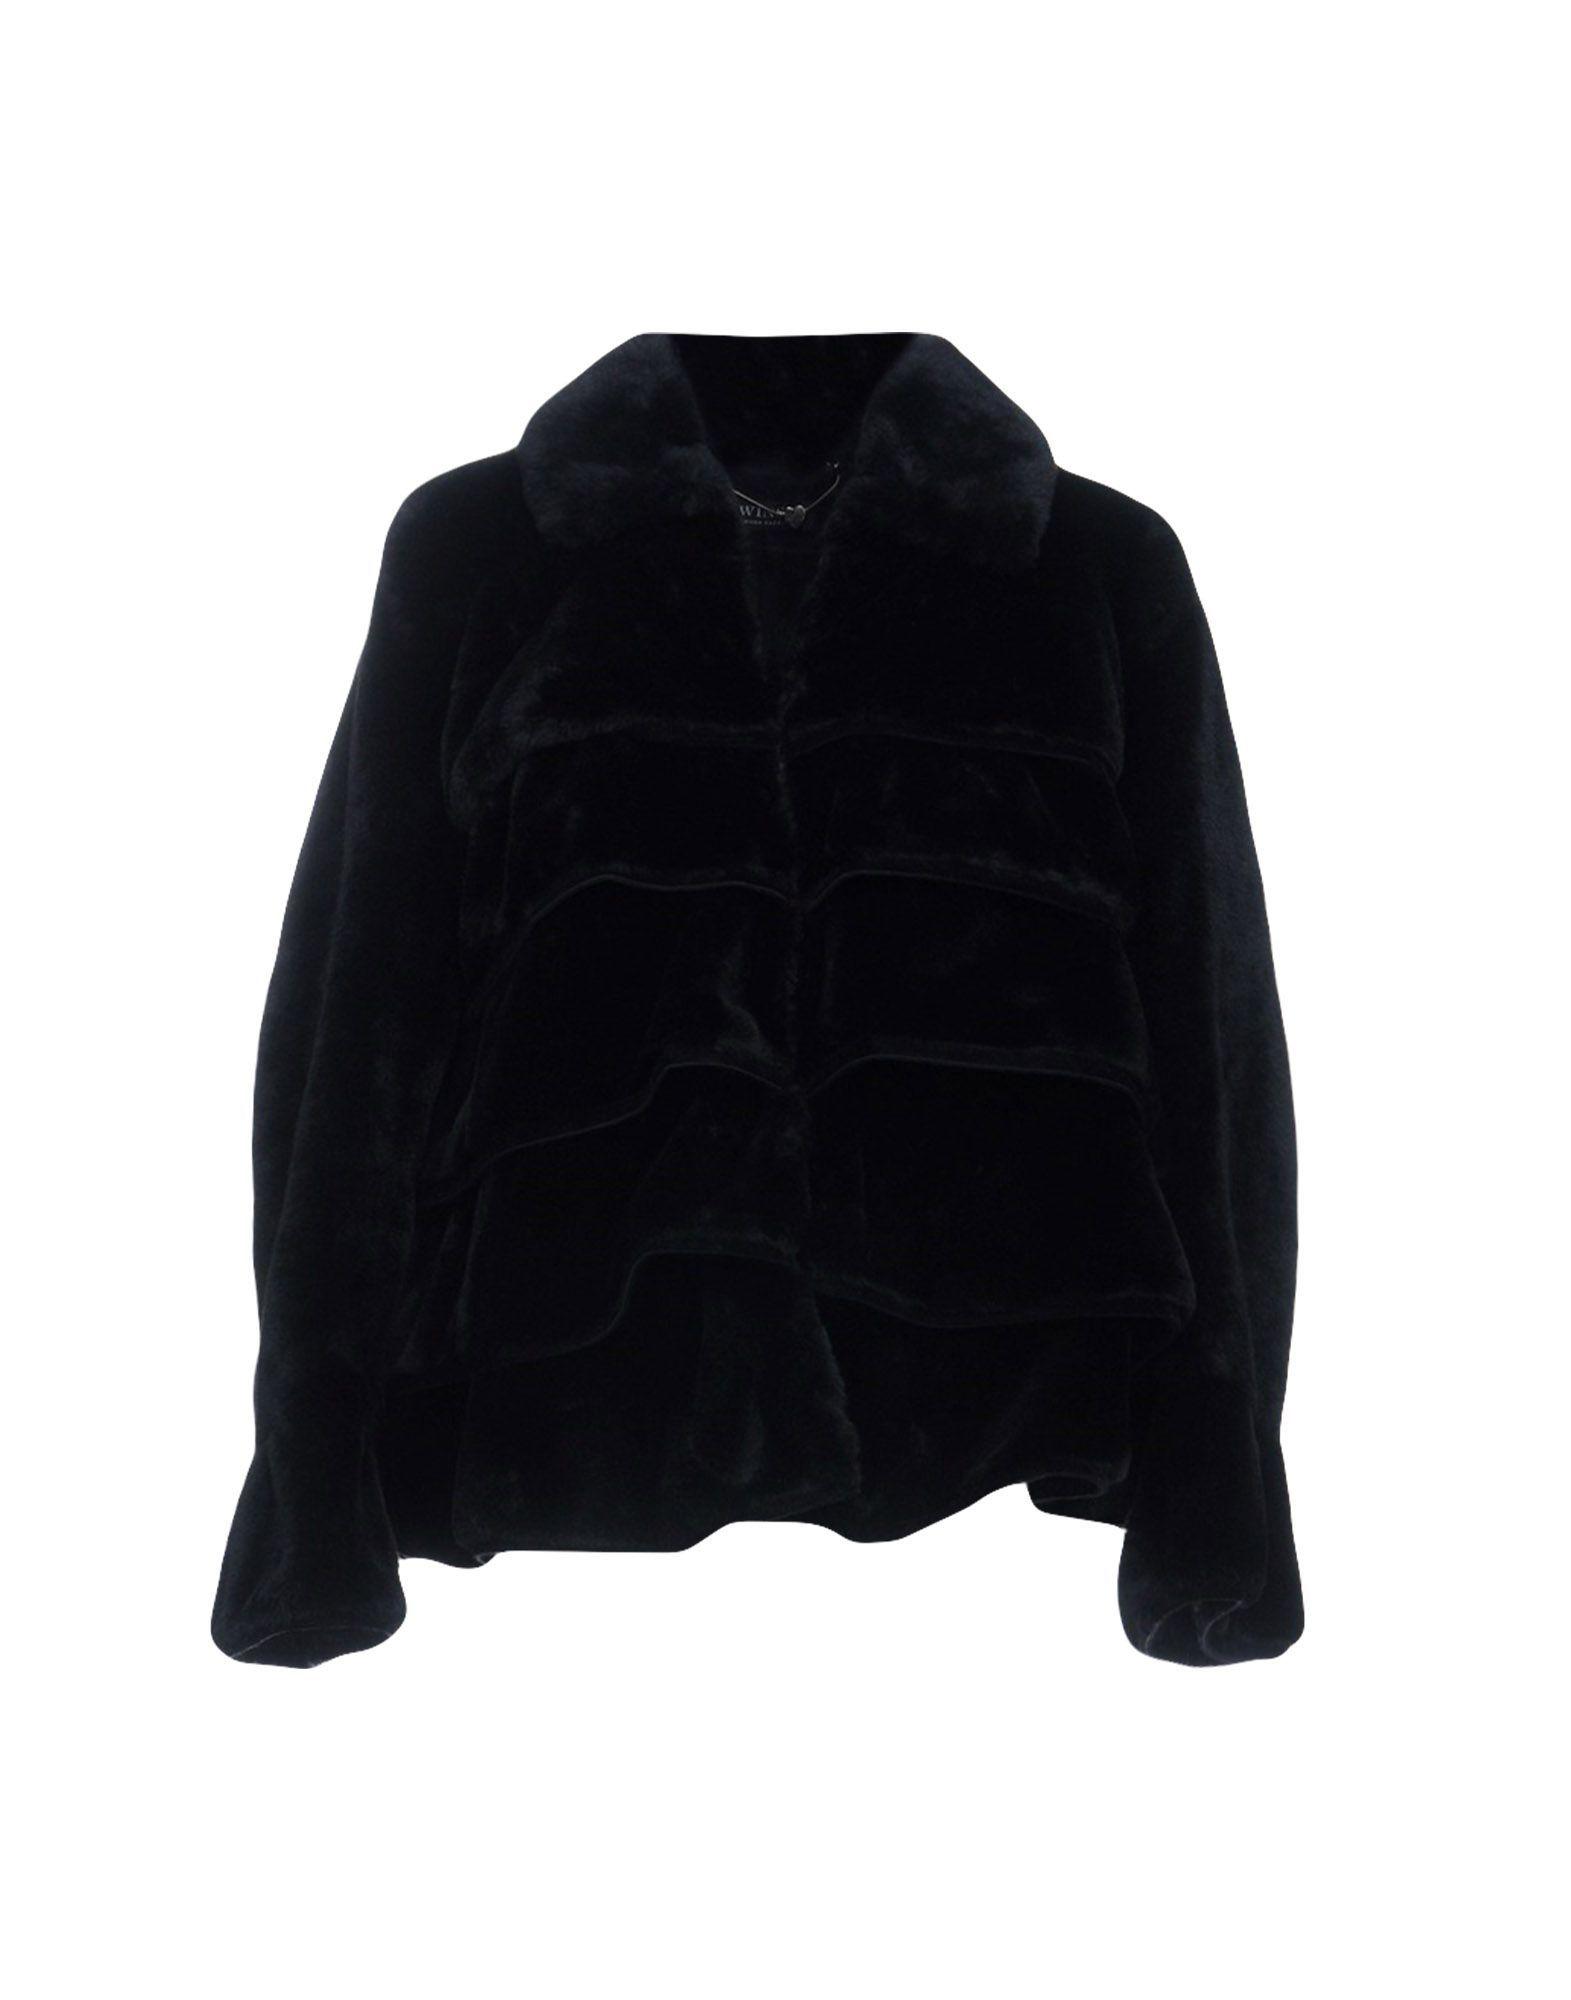 Twinset Black Faux Fur Jacket